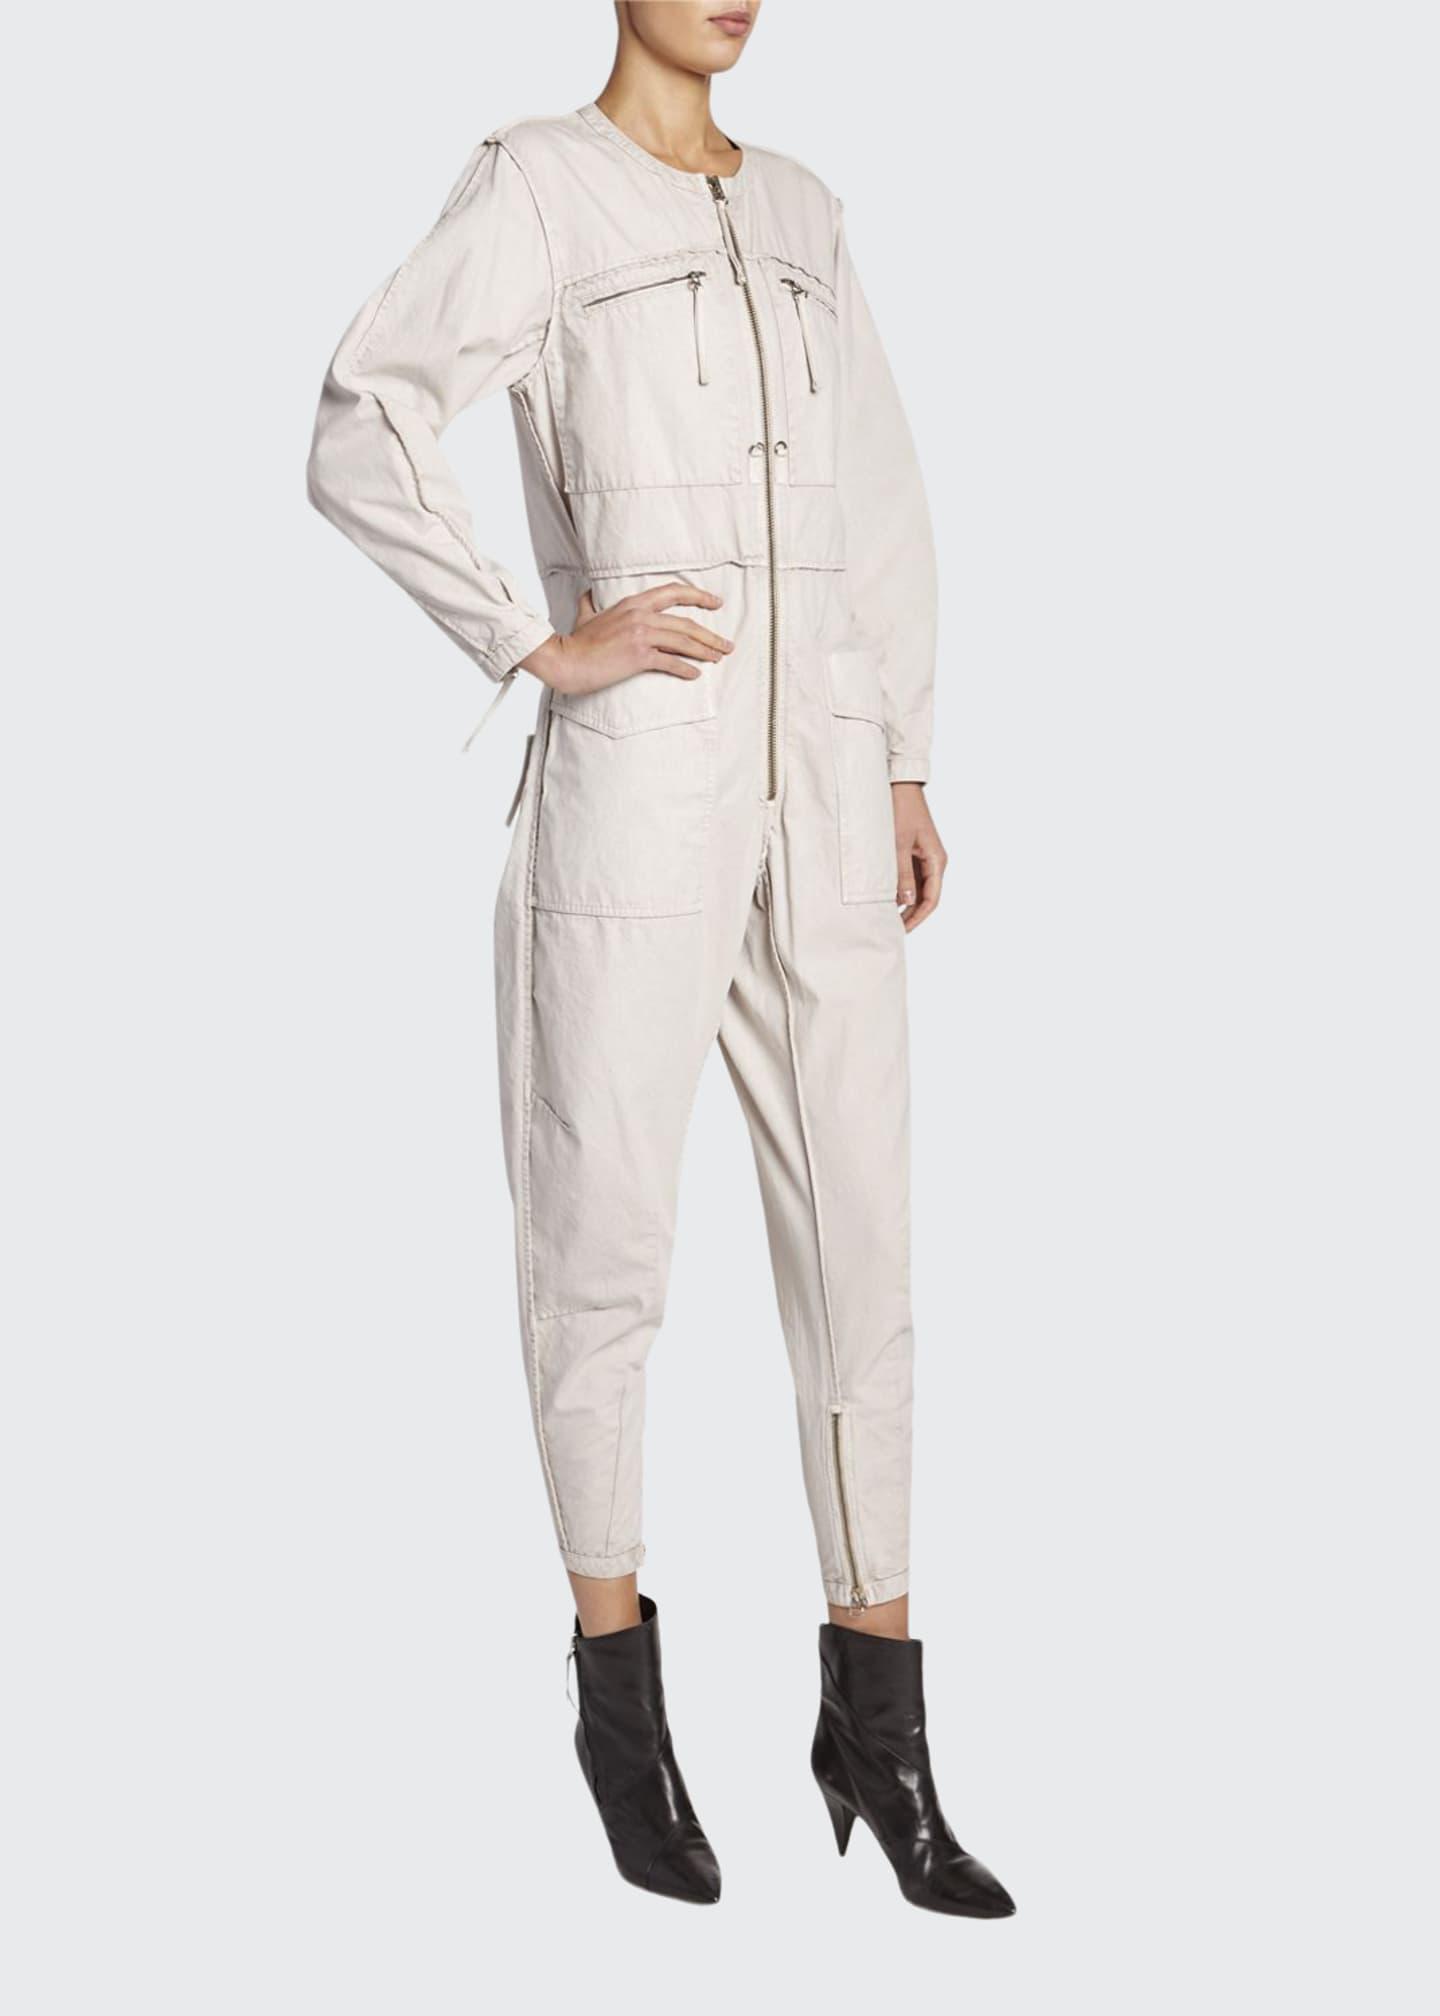 Etoile Isabel Marant Leiko Zip-Front Utility Jumpsuit